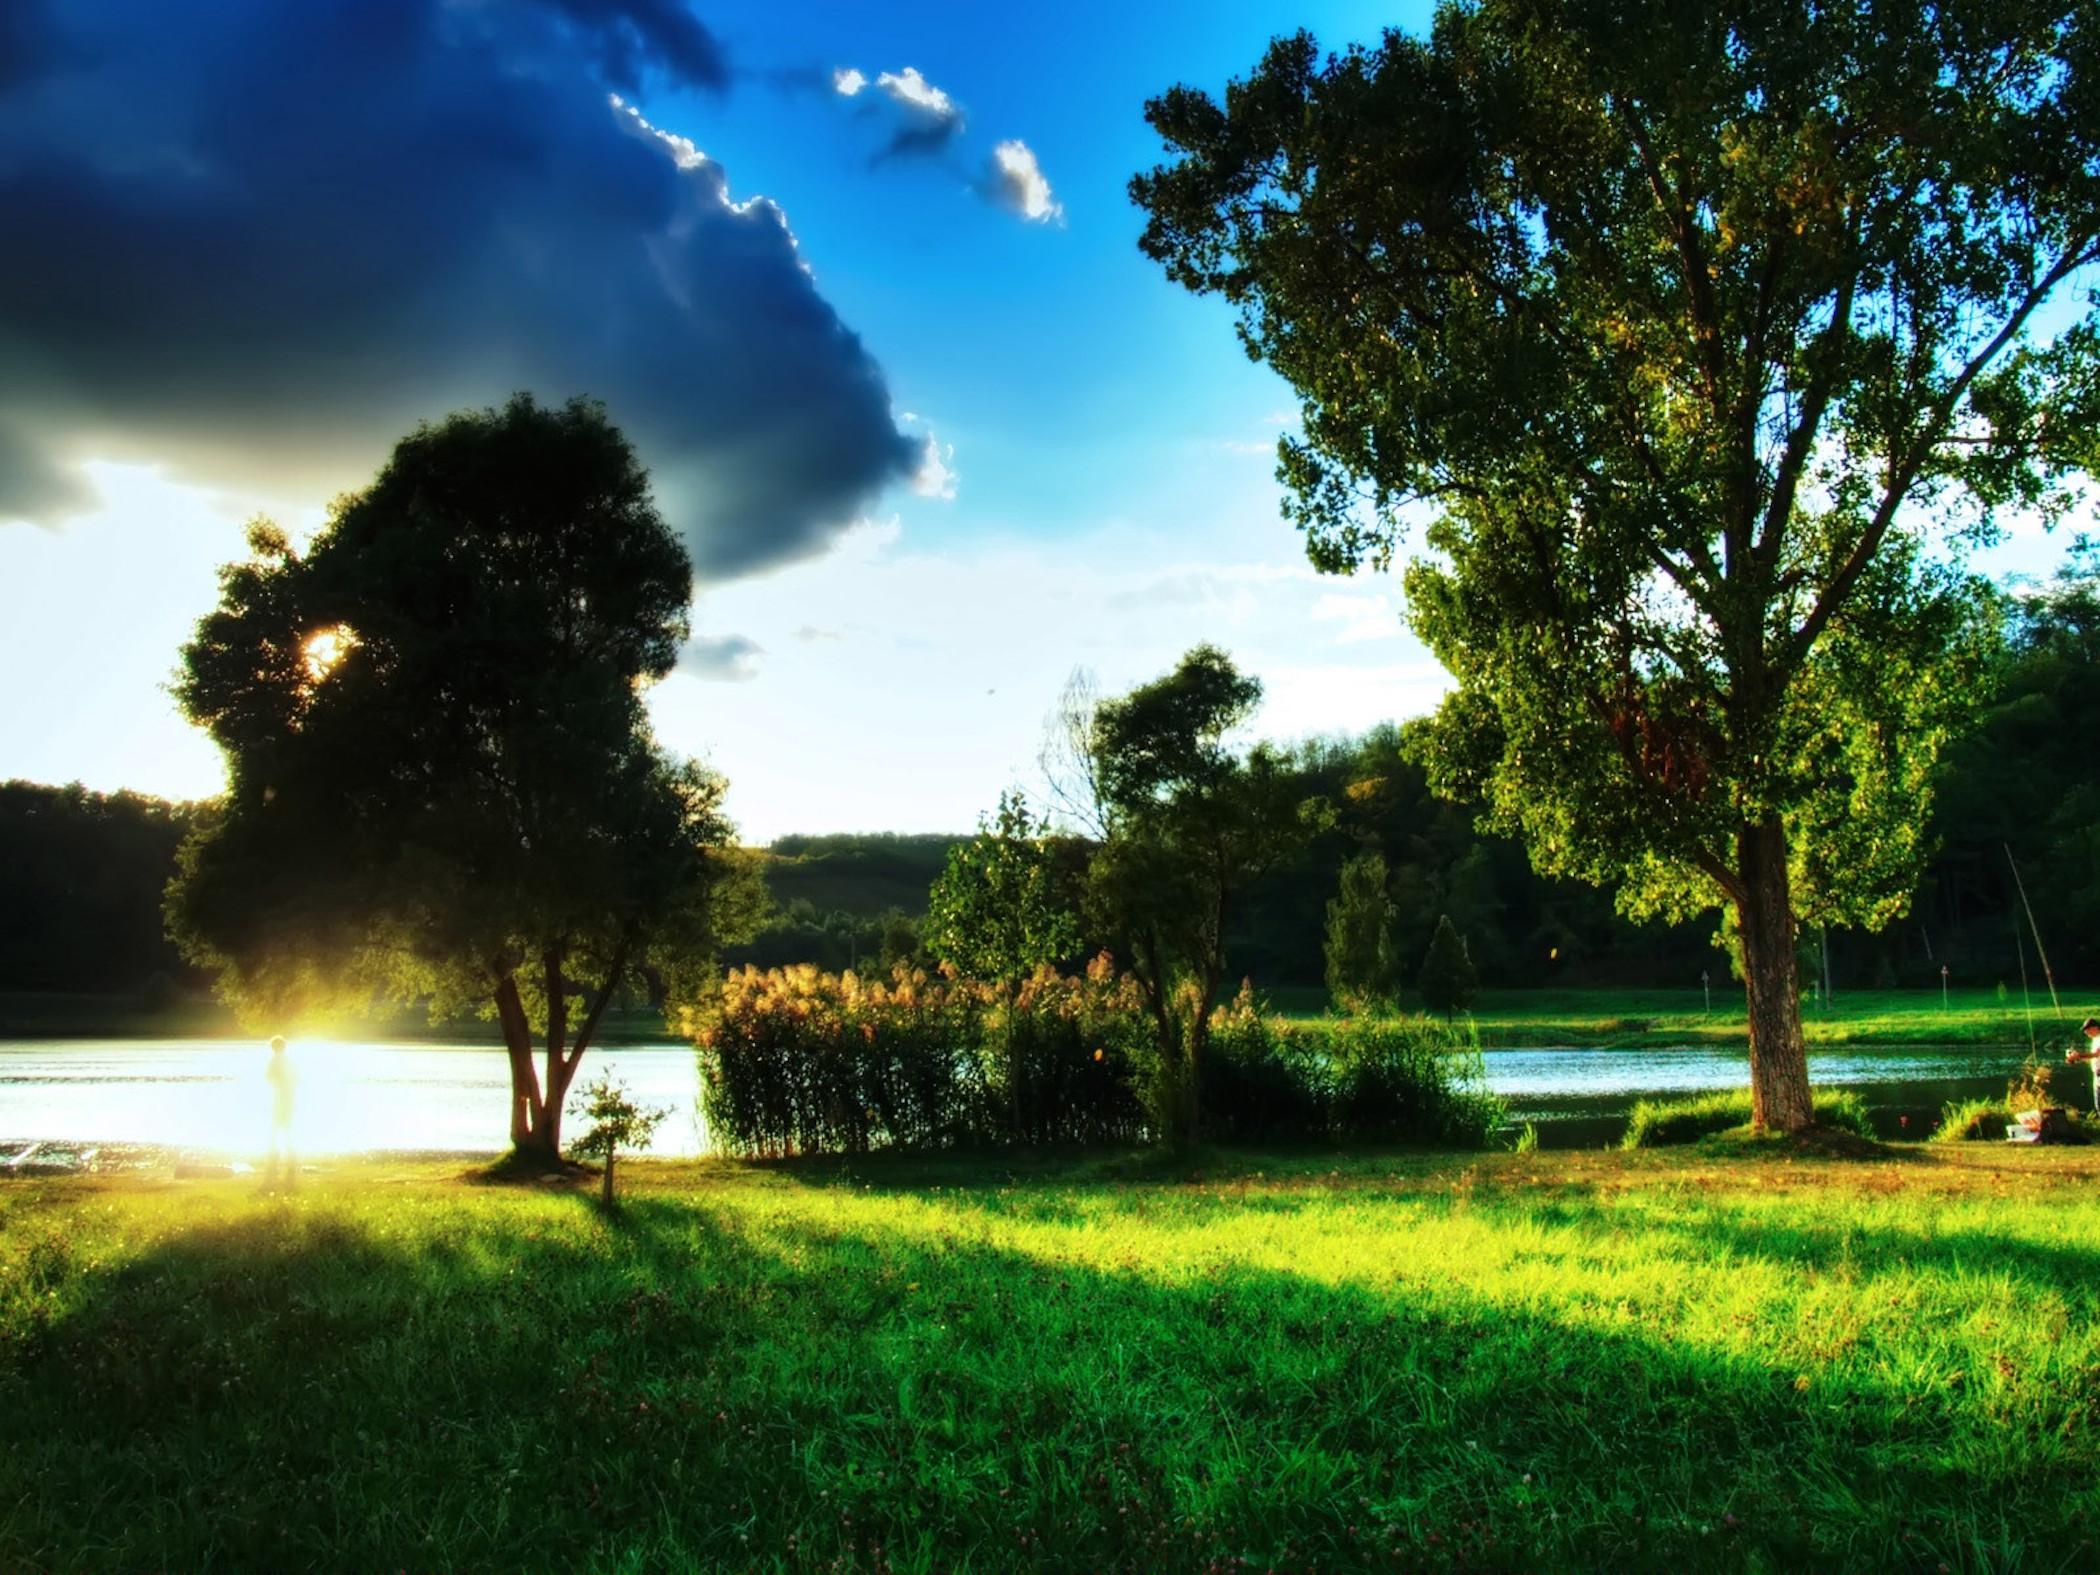 Beautiful Summer Day Landscape Wallpaper   HD 2100x1575